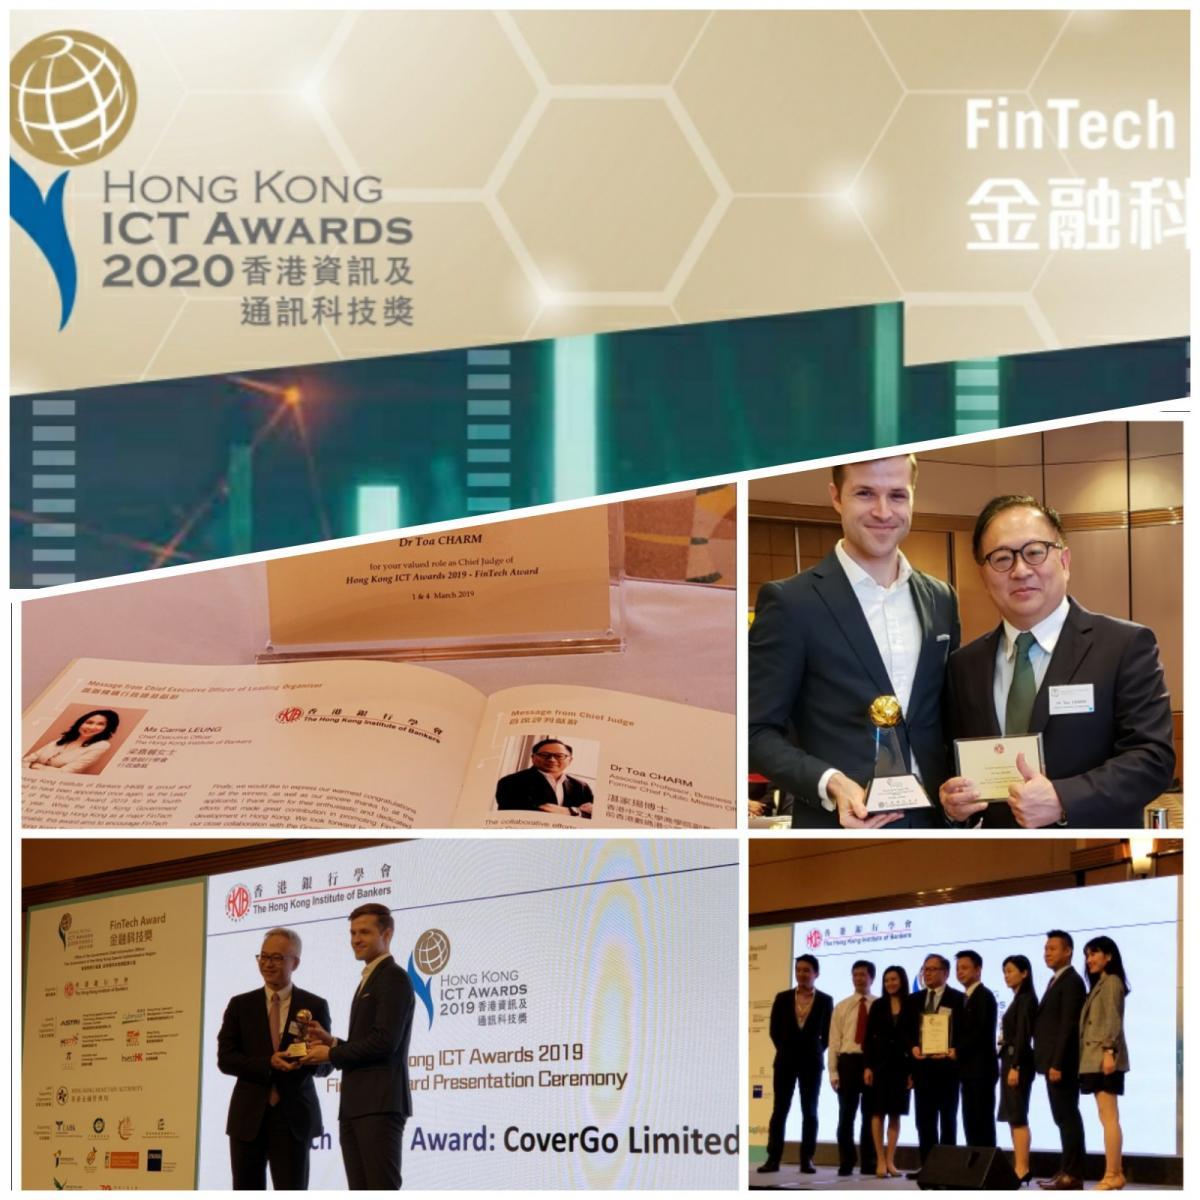 HKICT Awards 2020